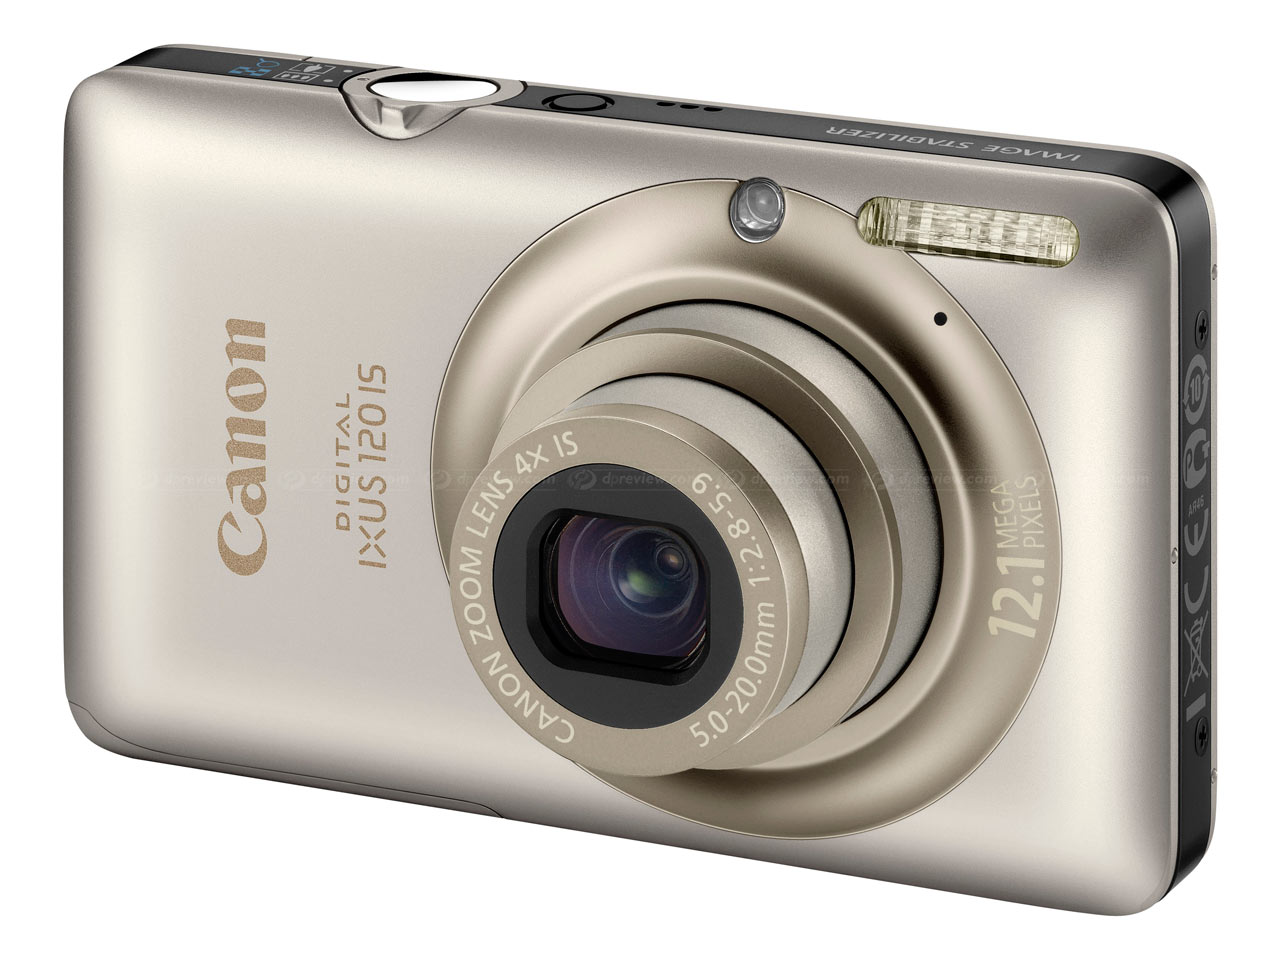 canon ixus 980 is manual